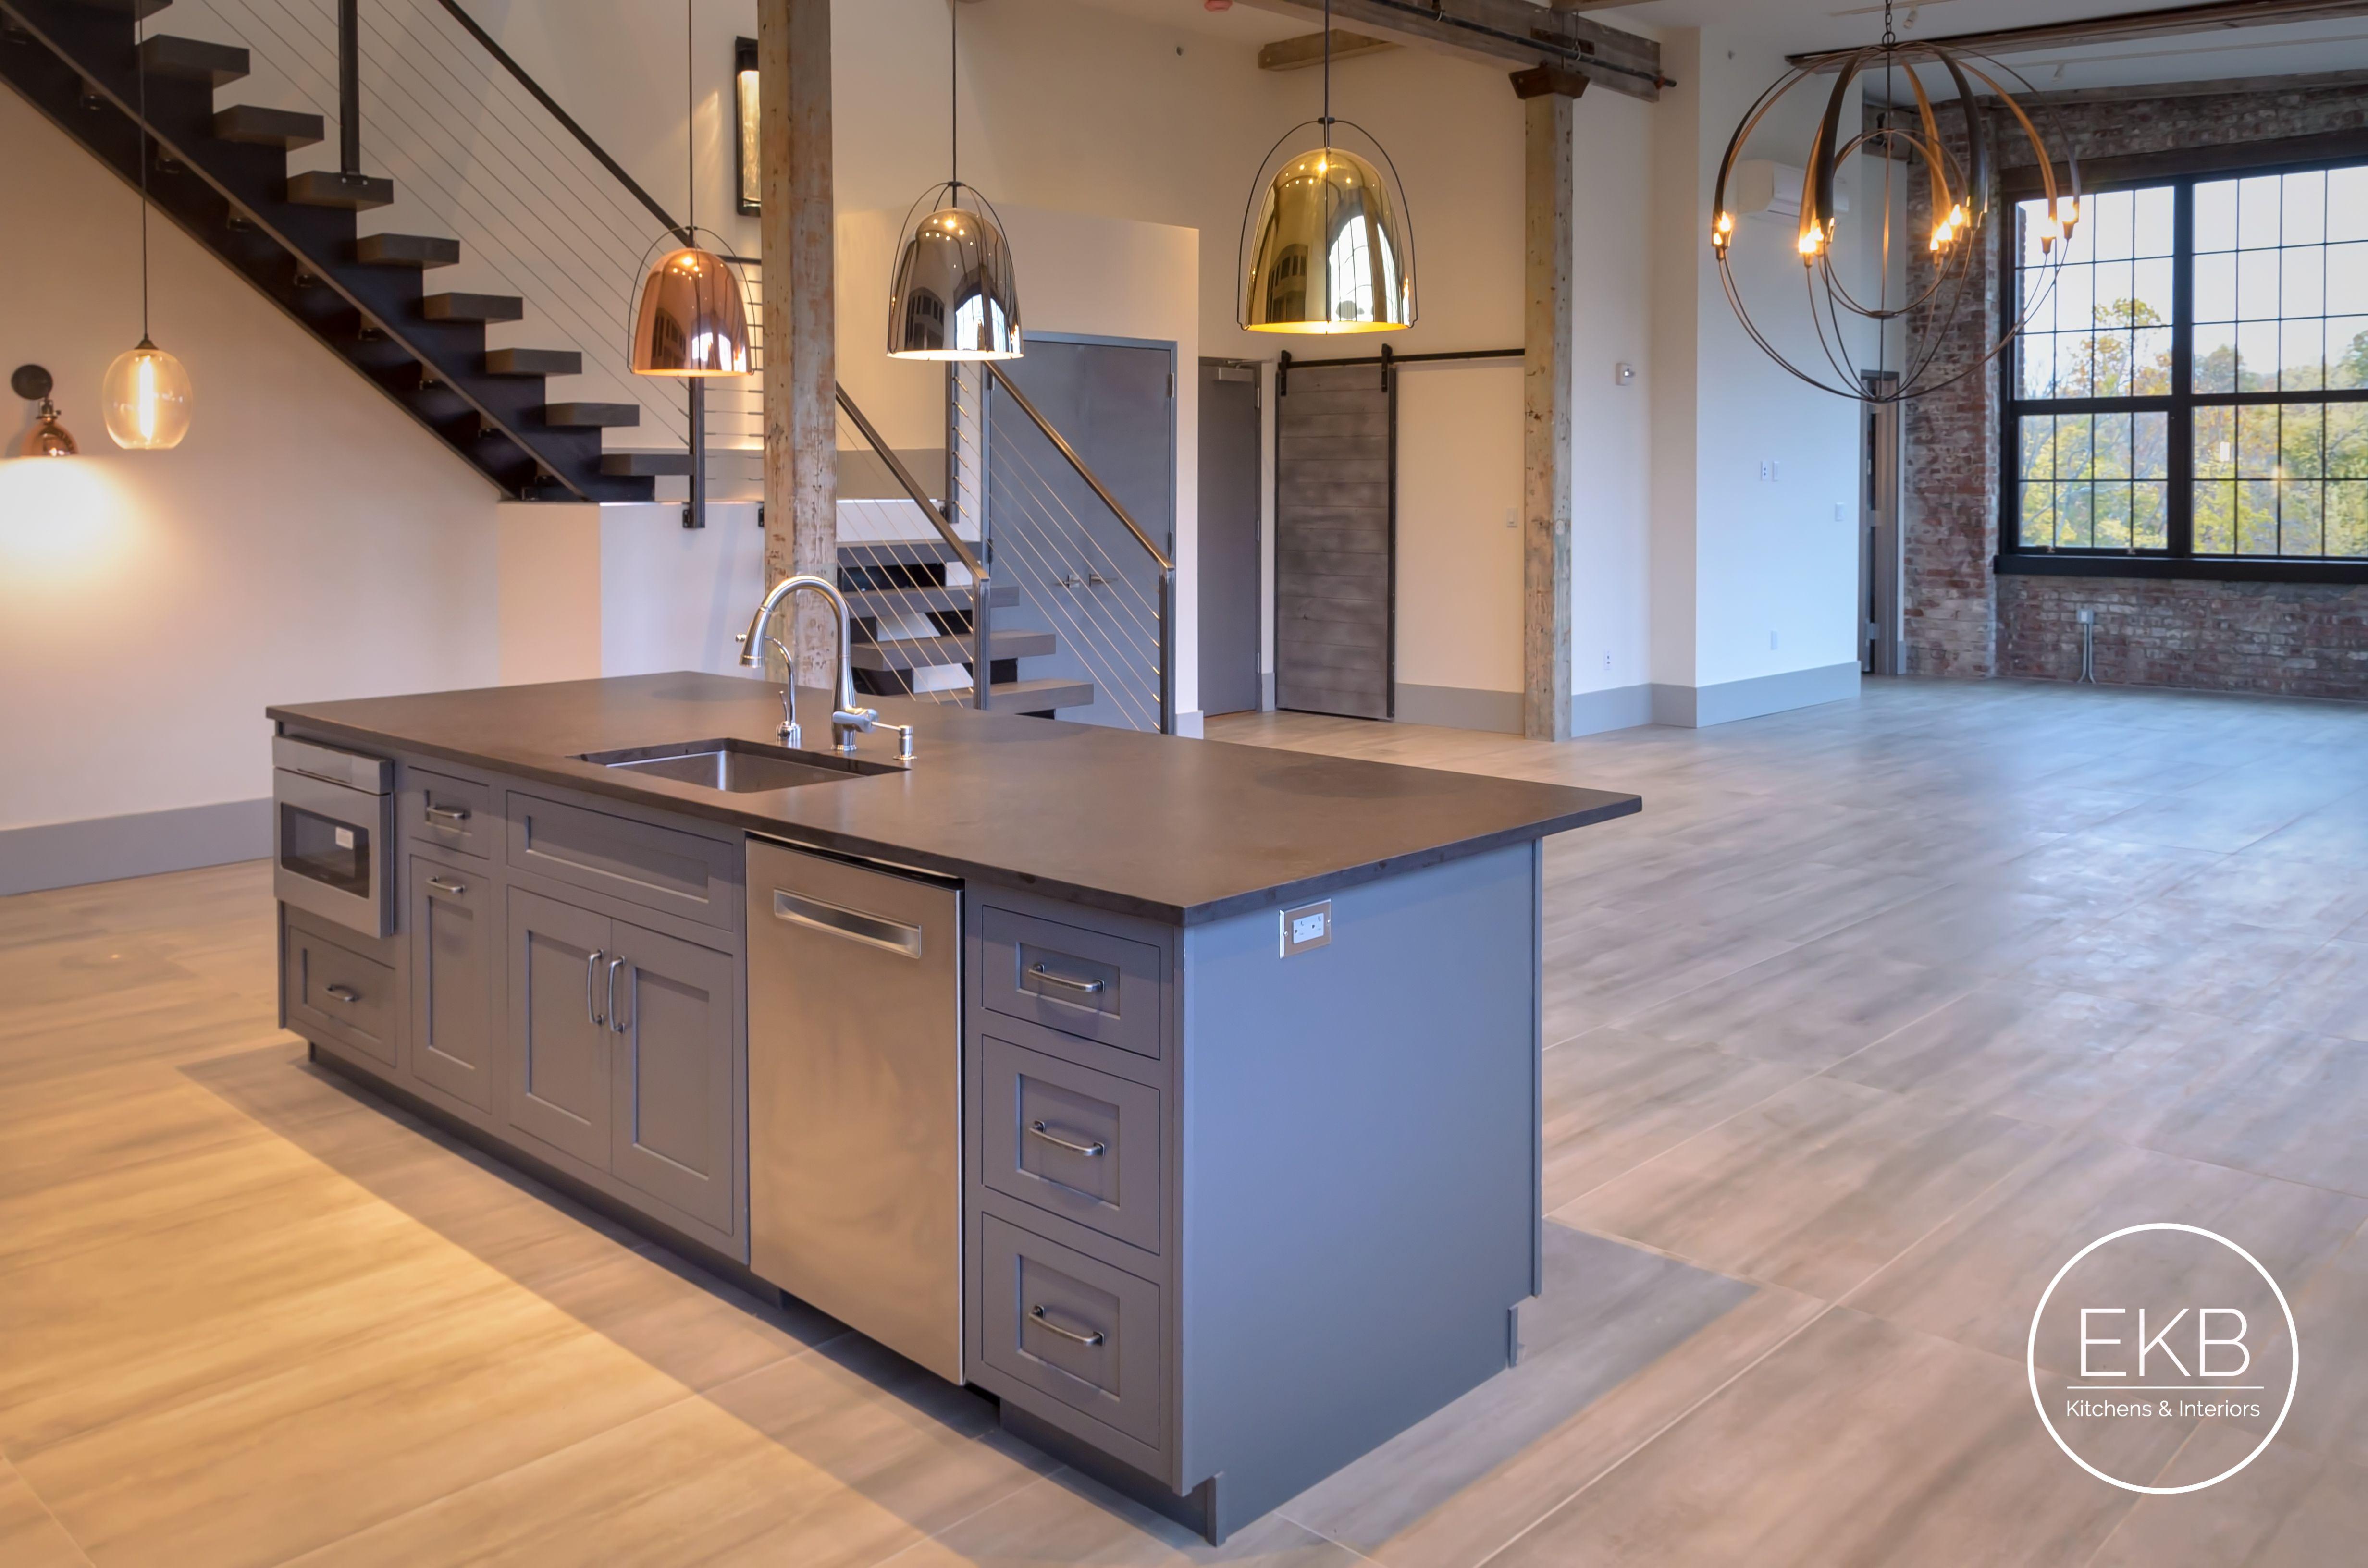 Pin by EKB Kitchens & Interiors on EKB Kitchen Islands